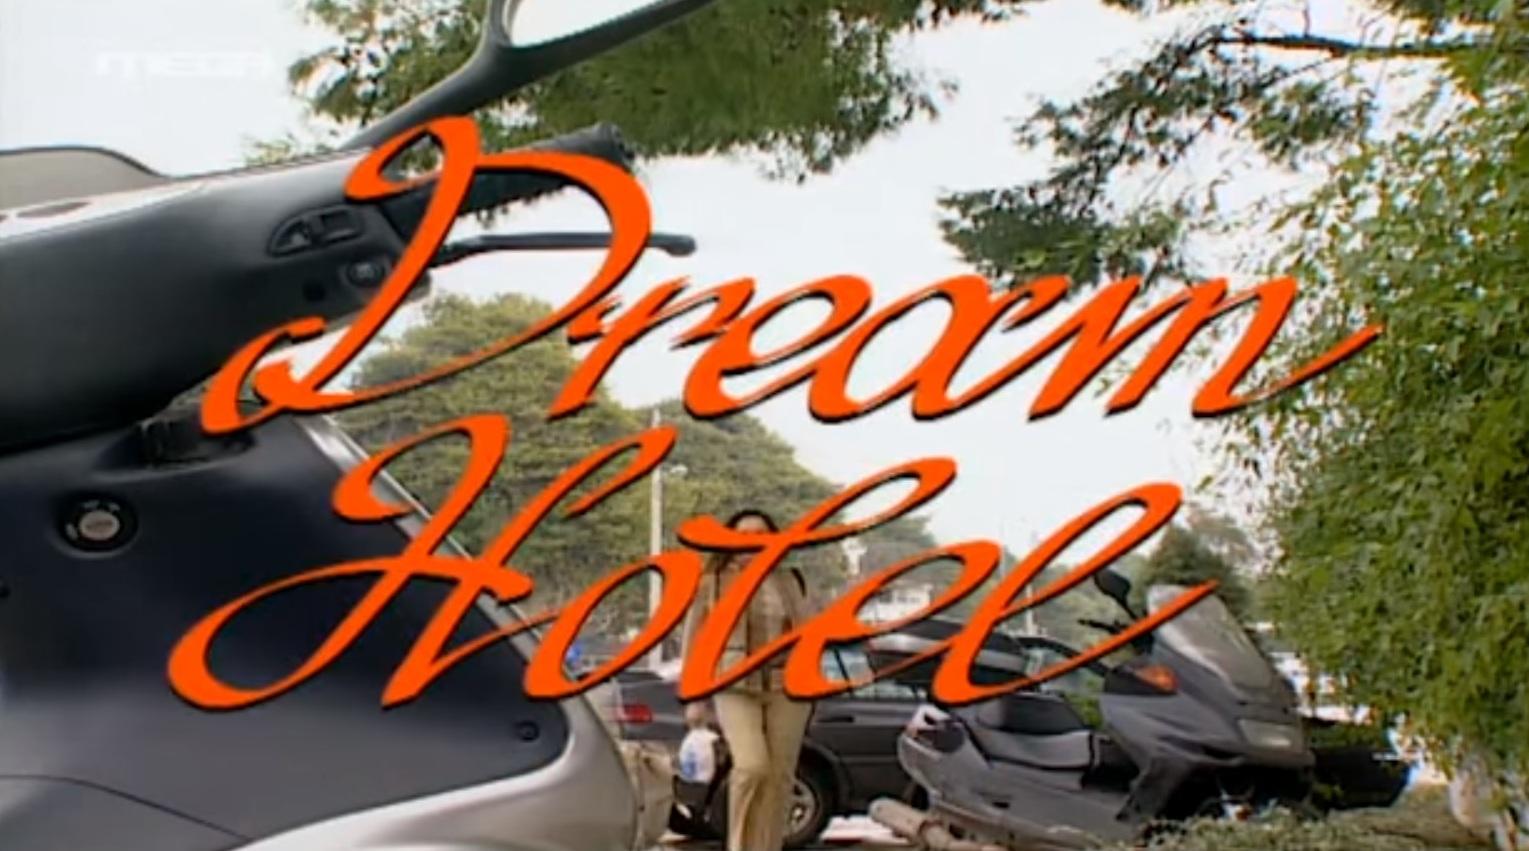 Dream Hotel (2002)